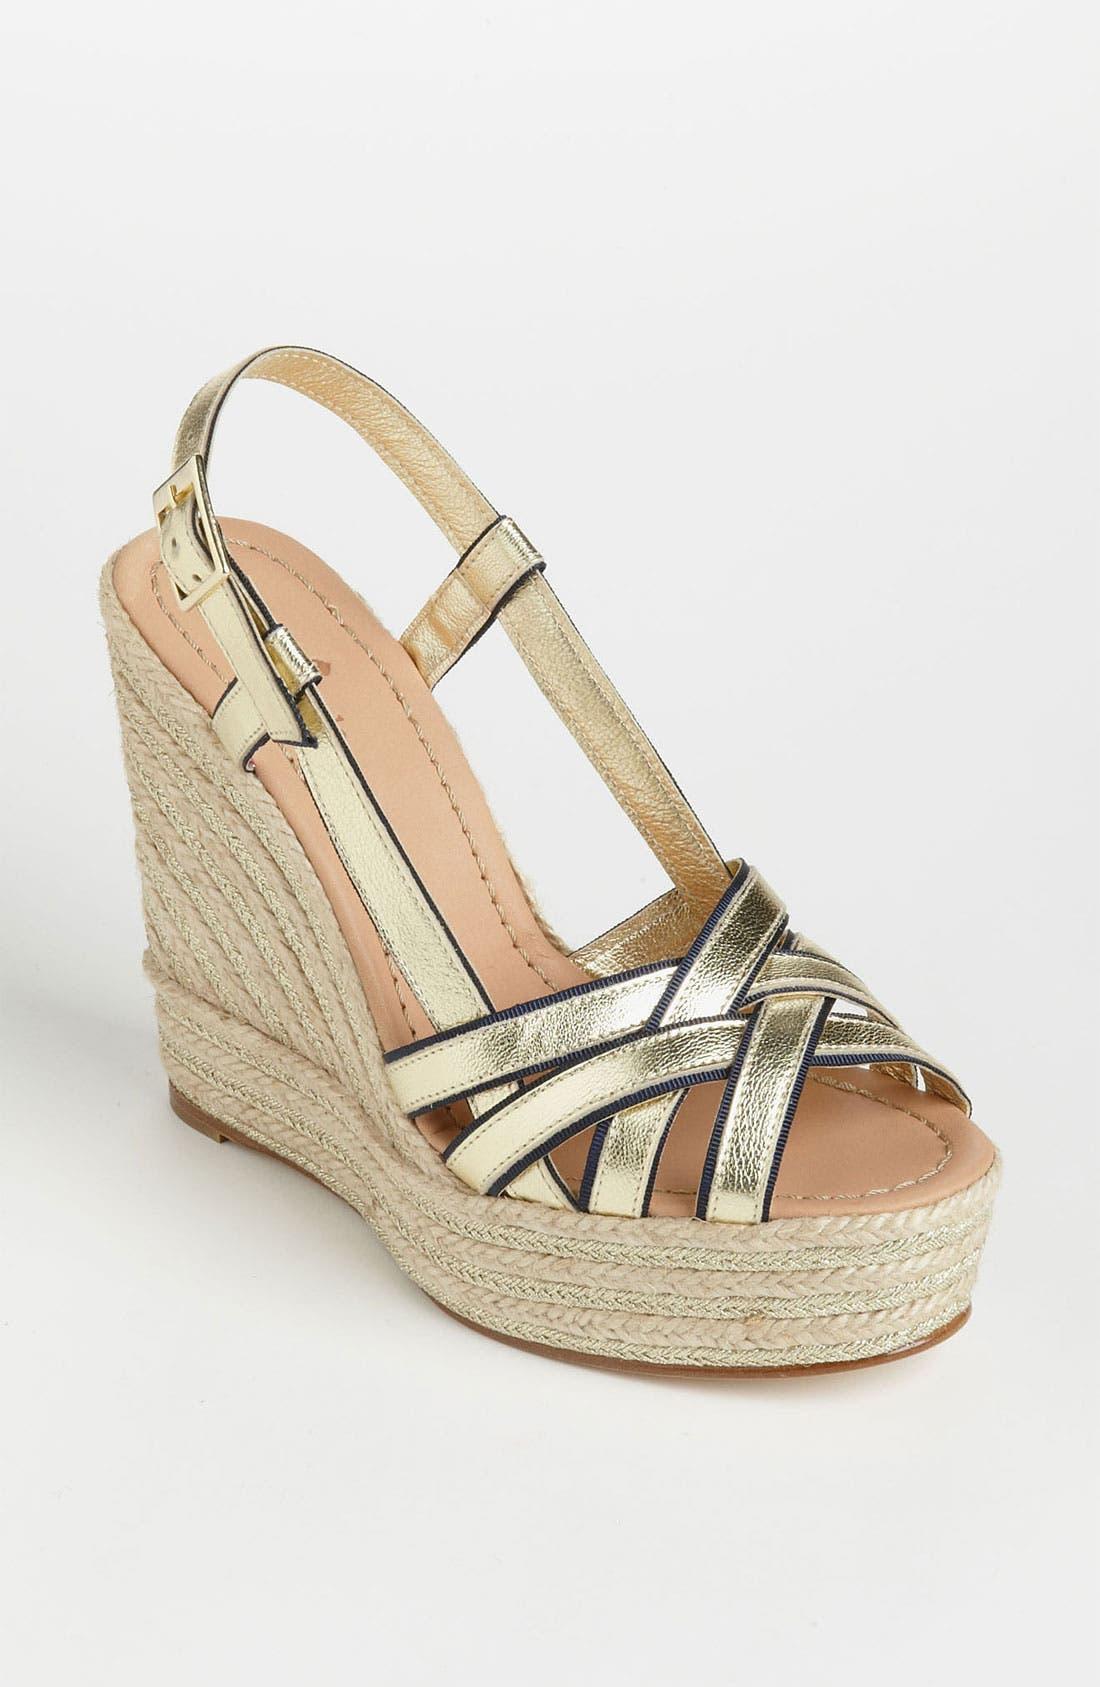 Alternate Image 1 Selected - kate spade new york 'ladan' wedge sandal